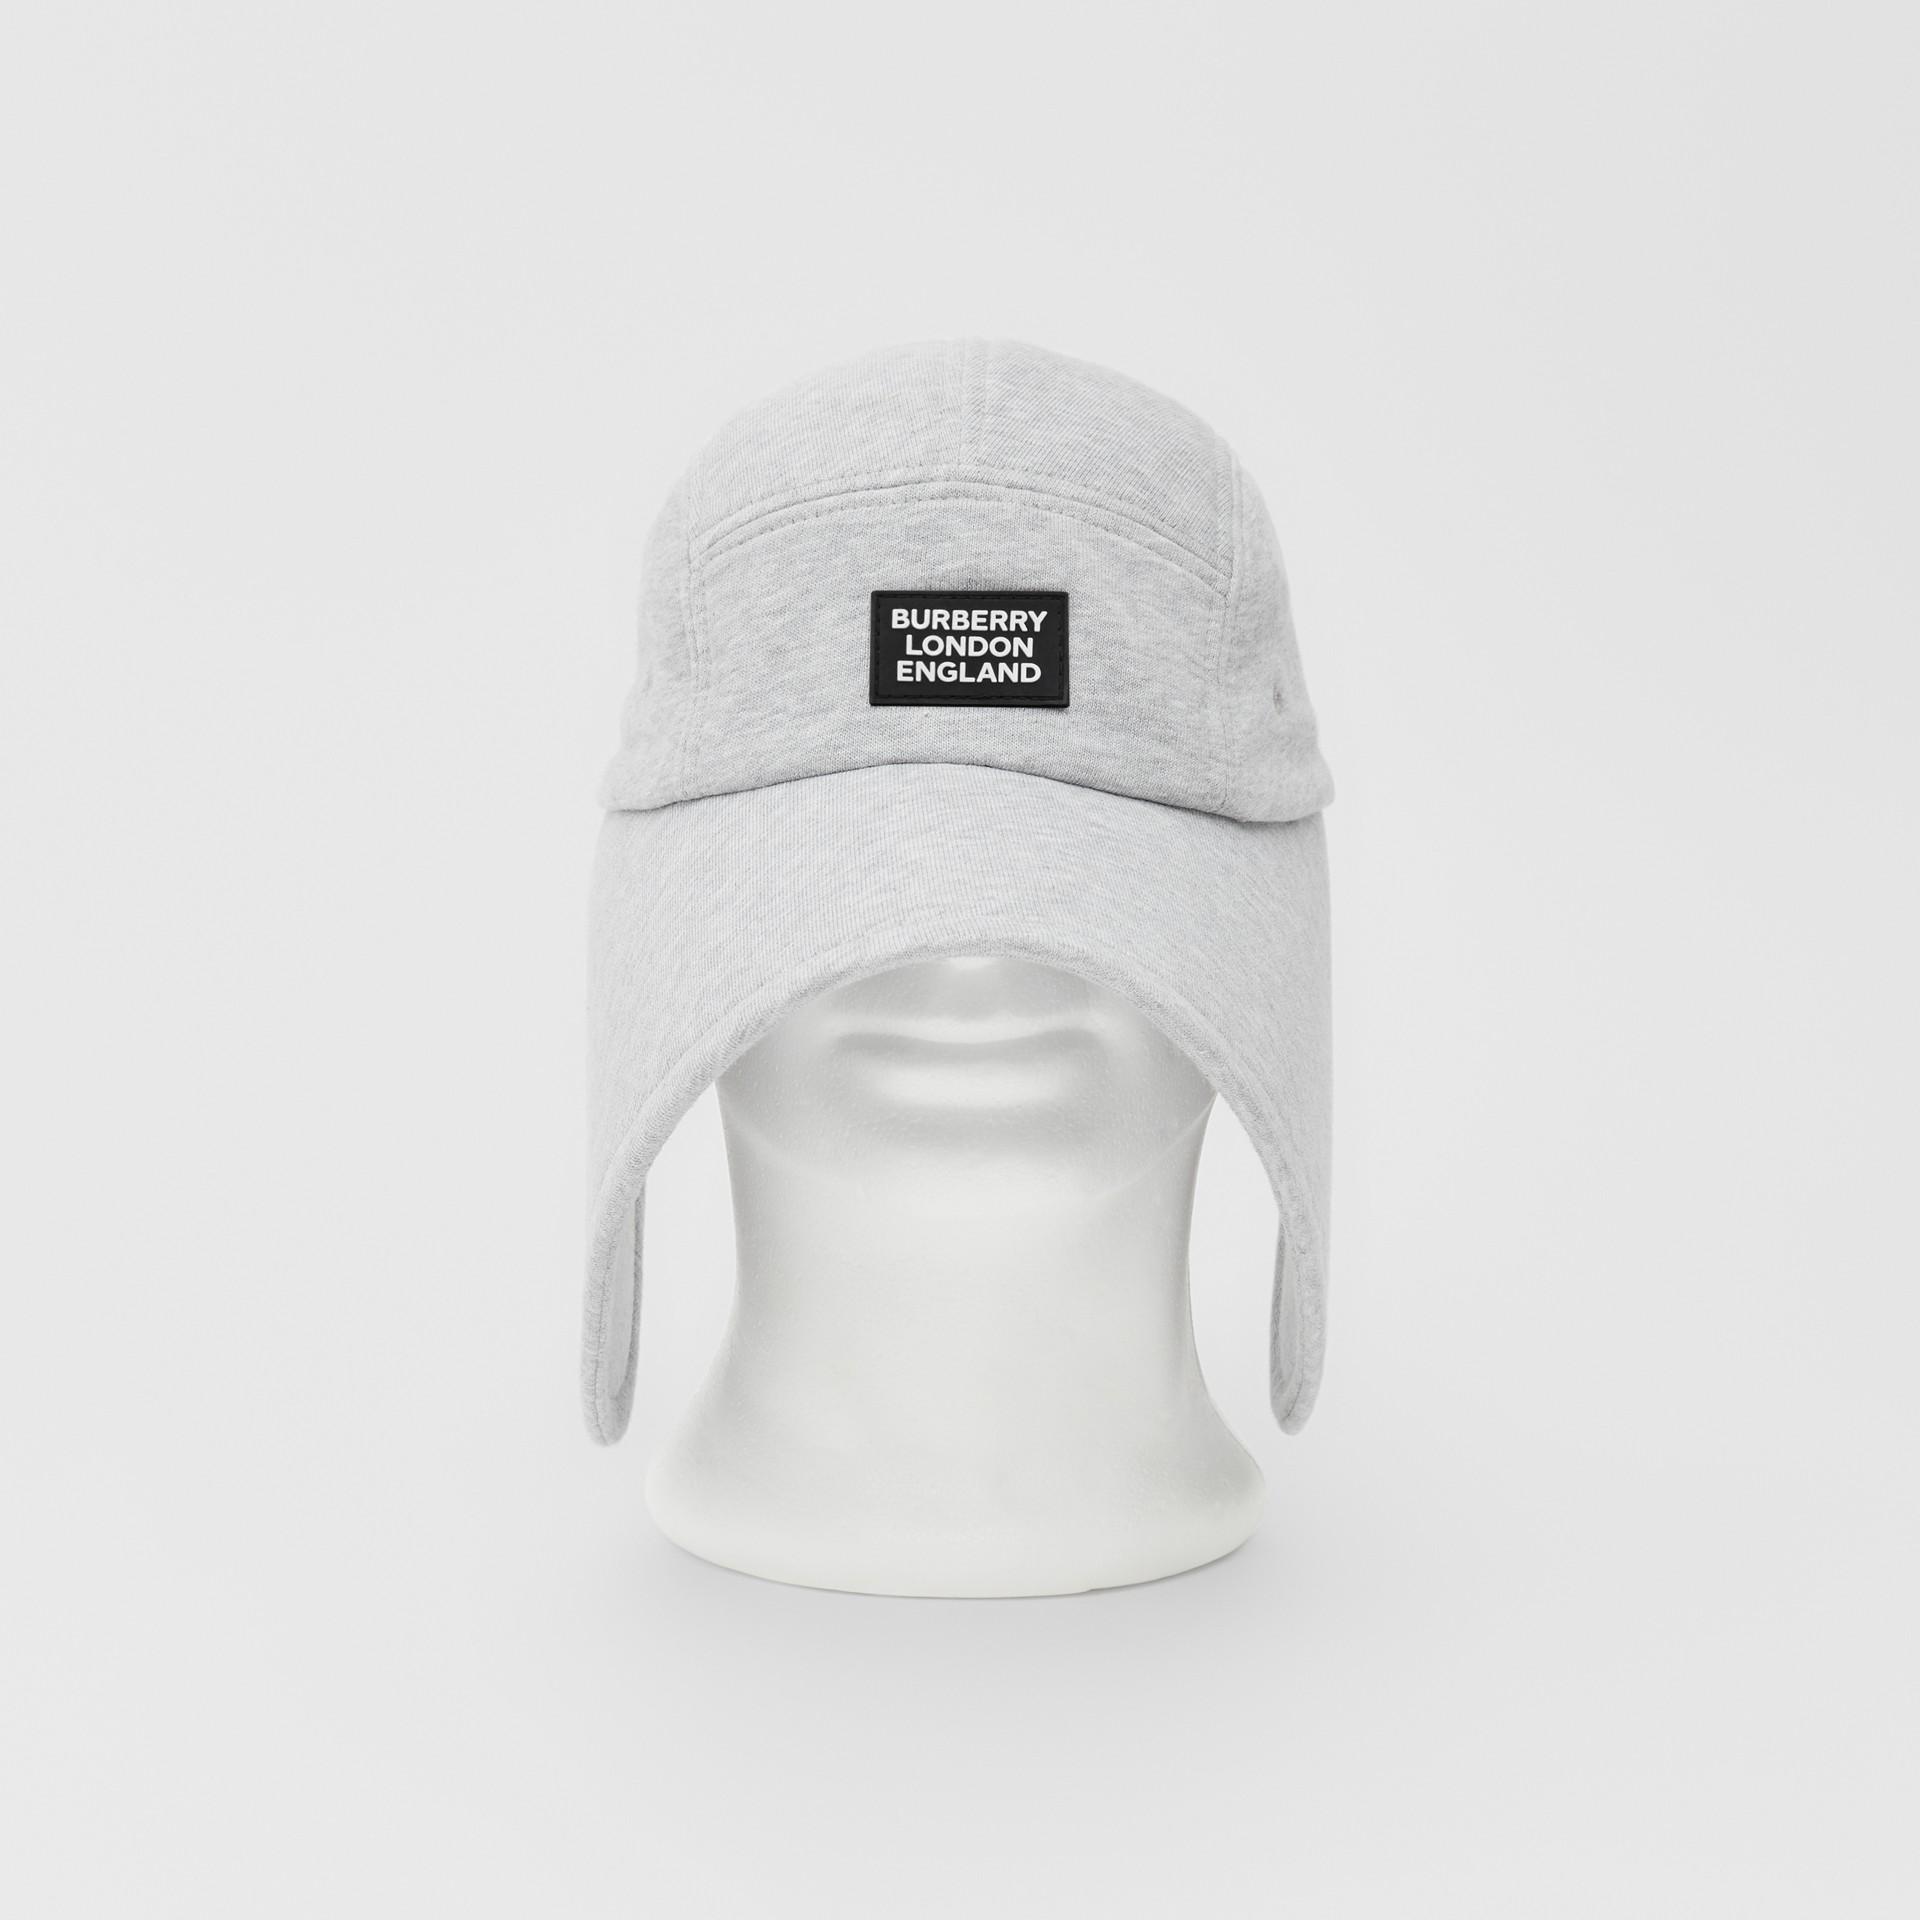 Hauben-Kappe aus Baumwolljersey mit Logo-Applikation (Helles Kieselgrau) | Burberry - Galerie-Bild 0